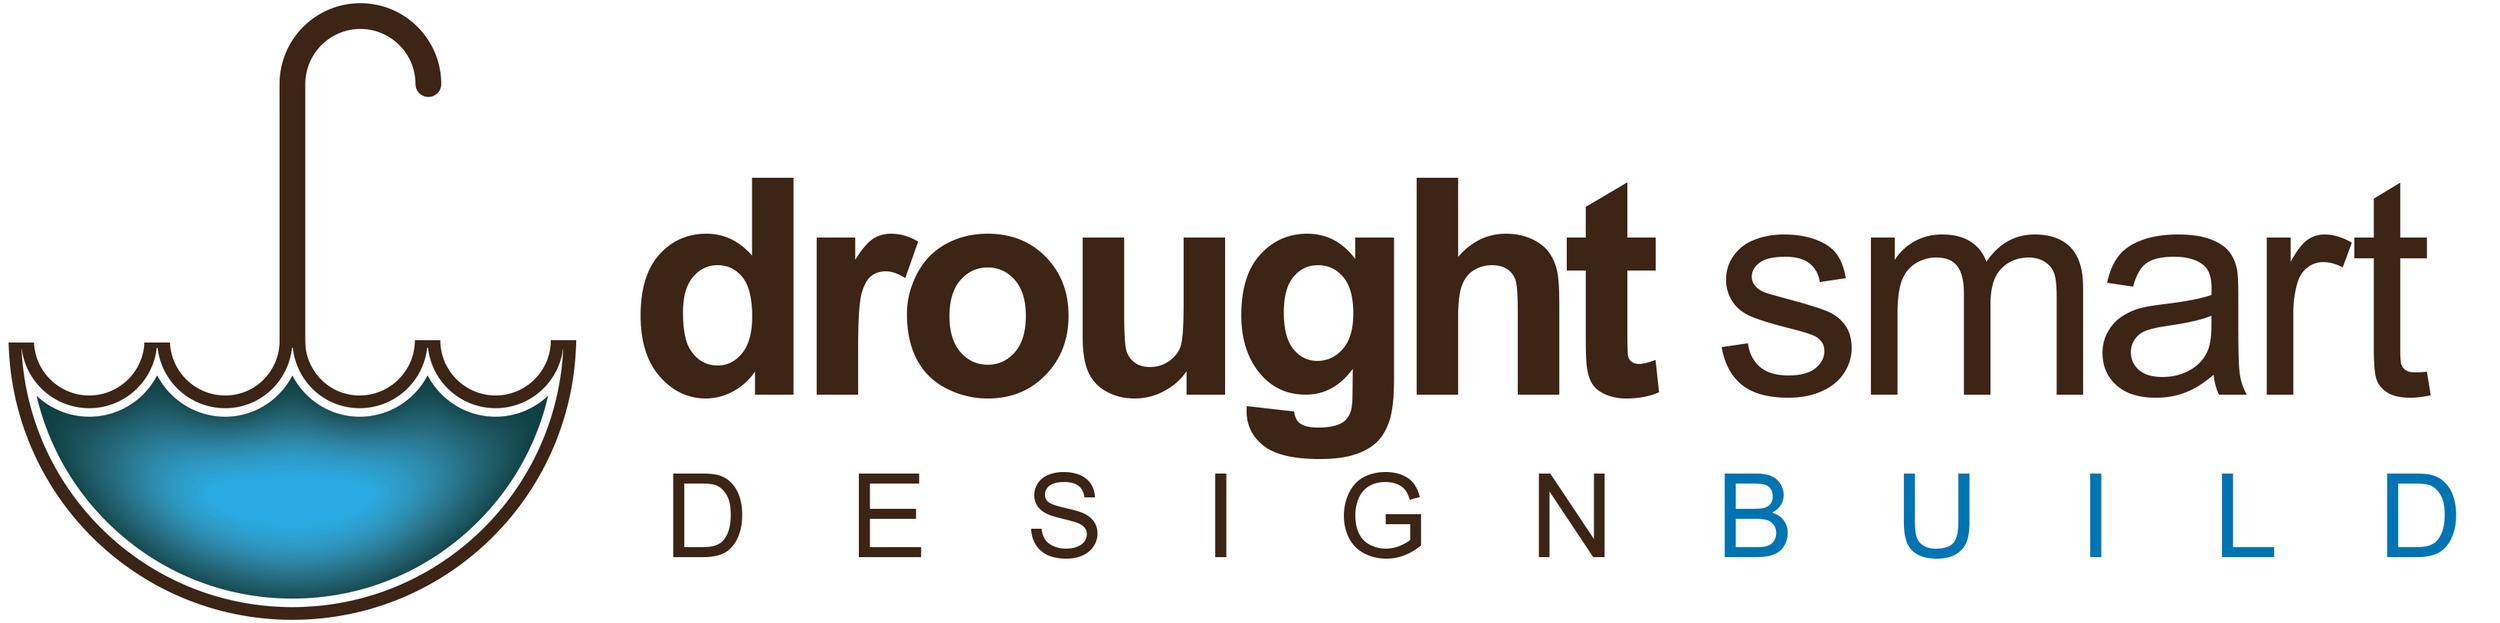 droughtsmart-logo1.jpg